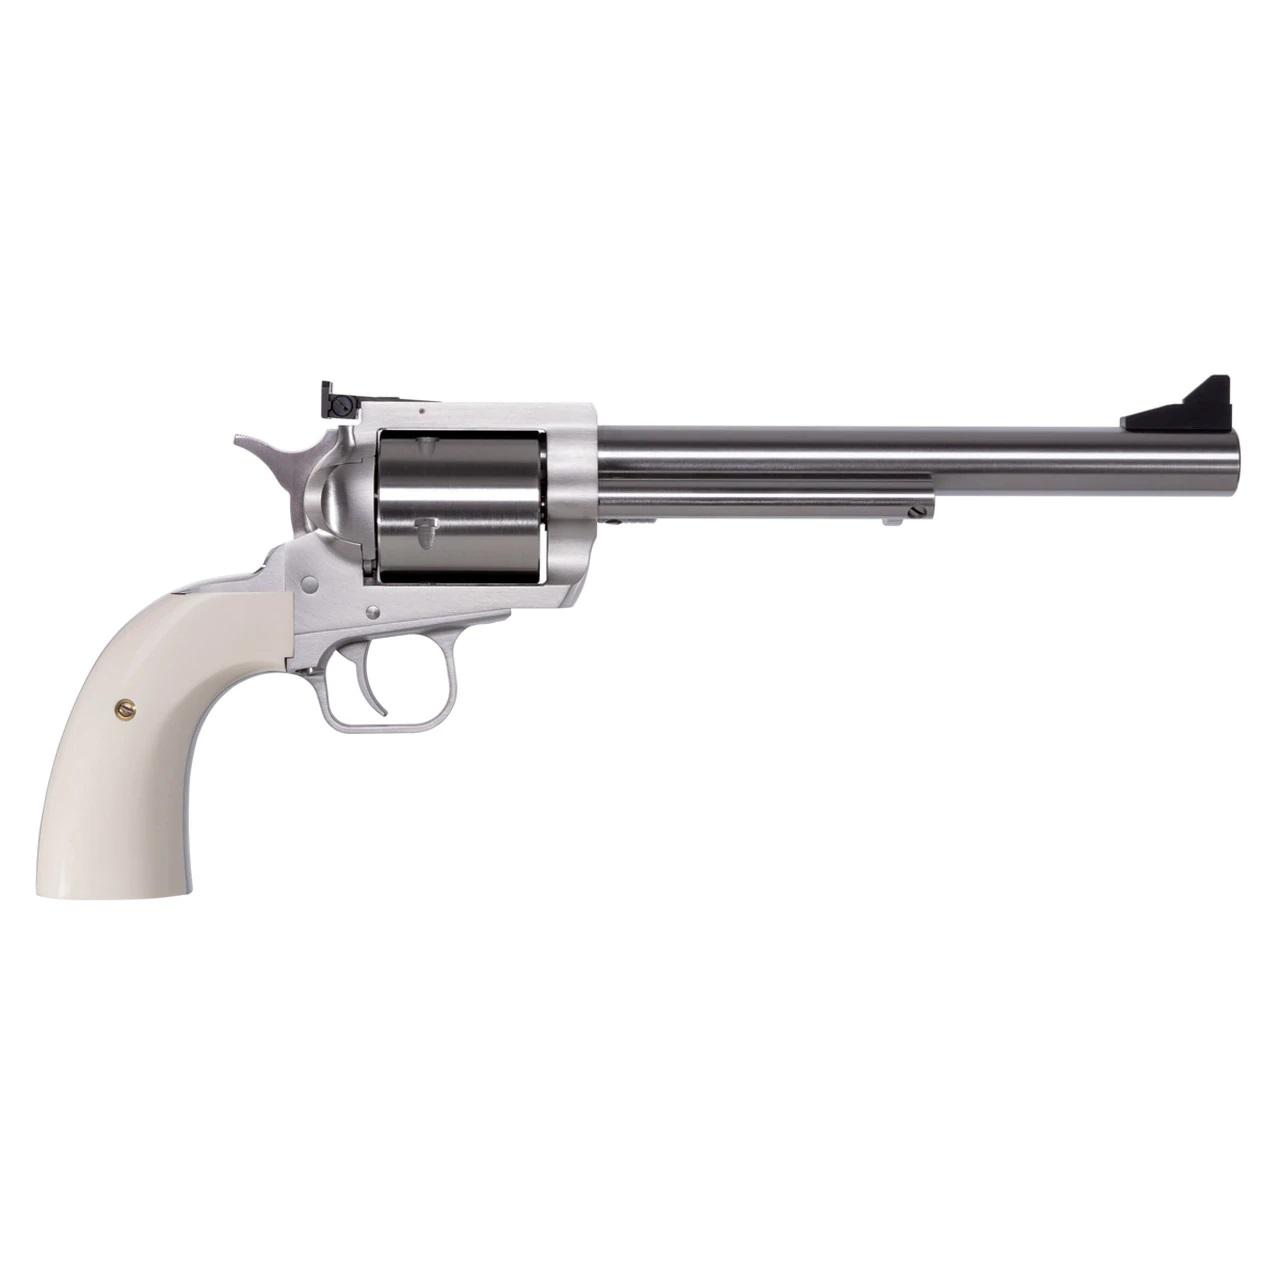 Magnum Research BFR Revolver 454 Casull